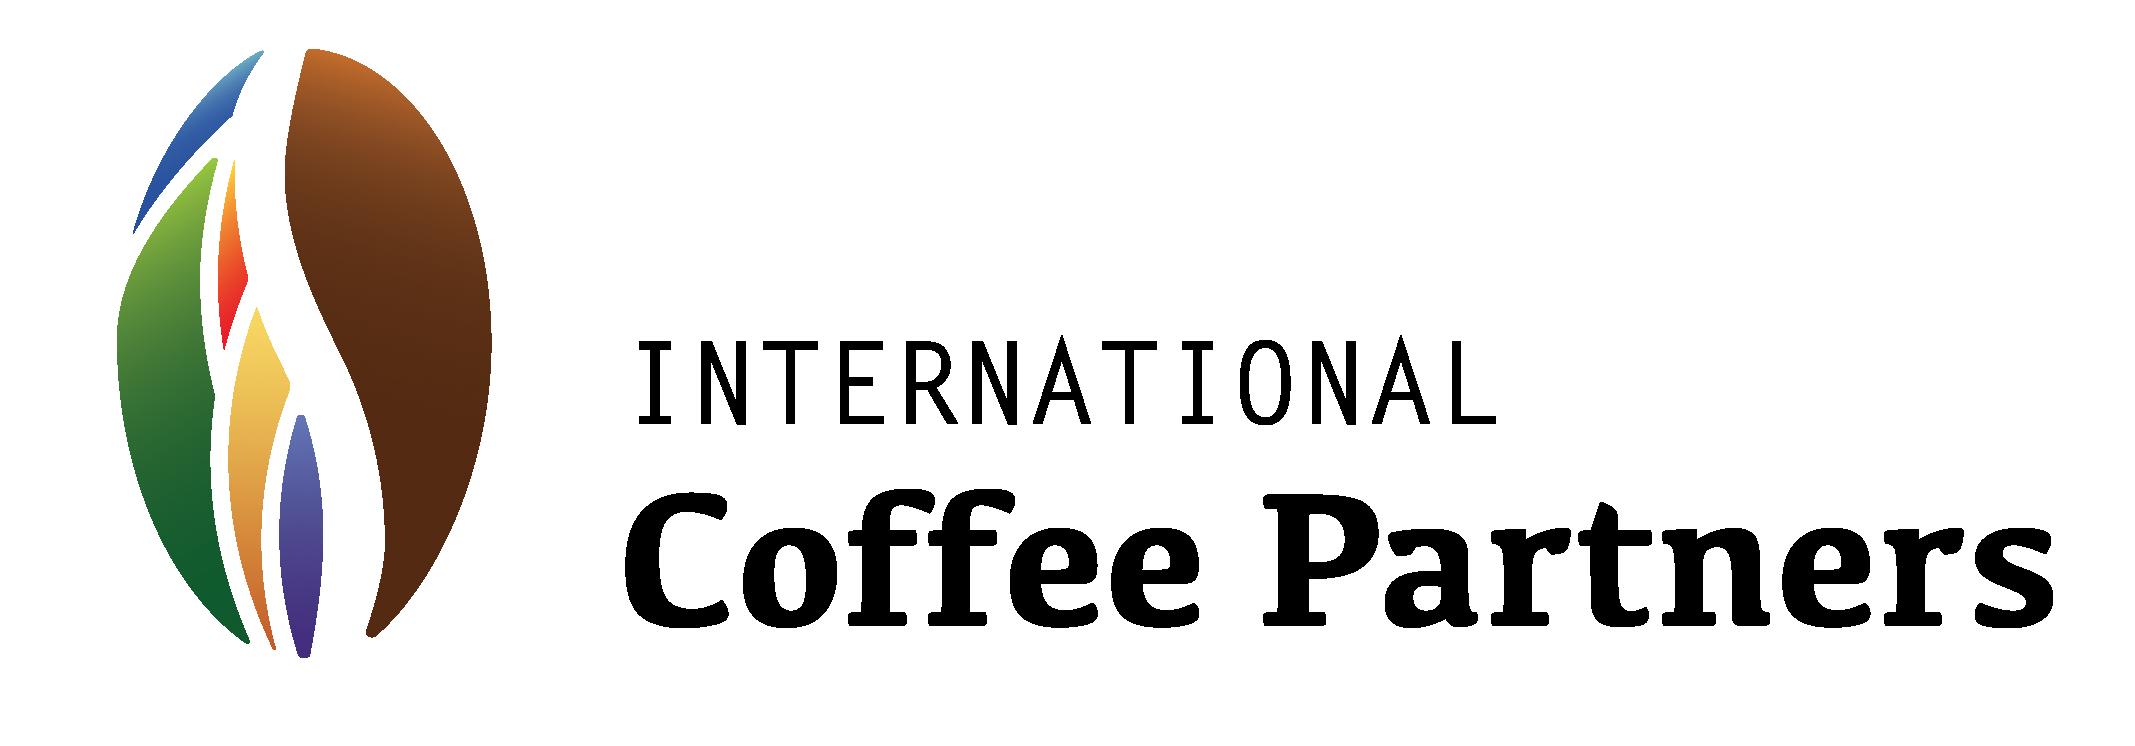 International Coffee Partners logo